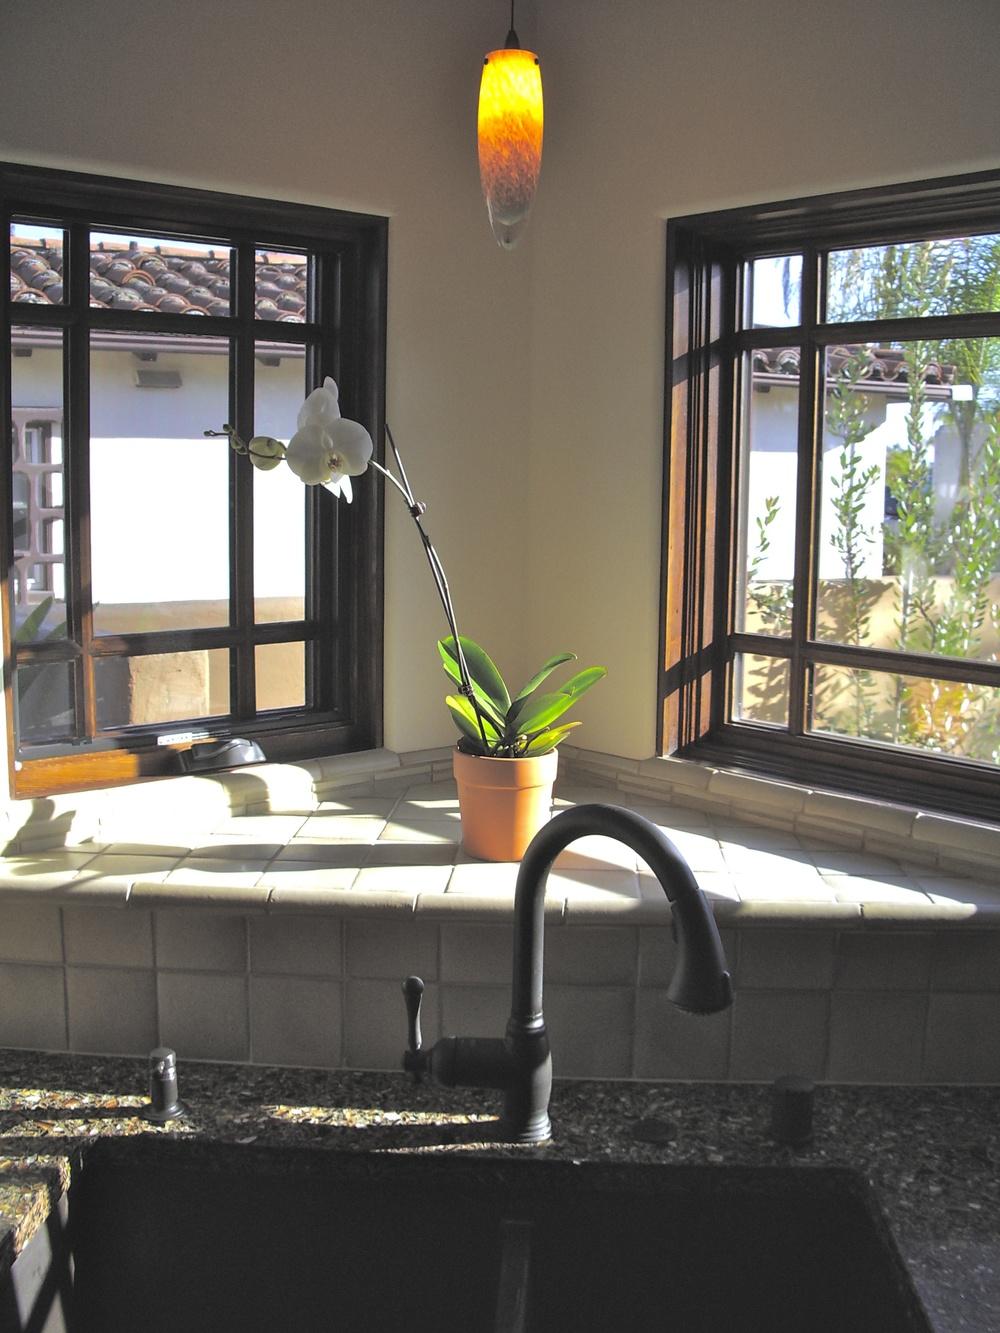 Sunny corner for sink.